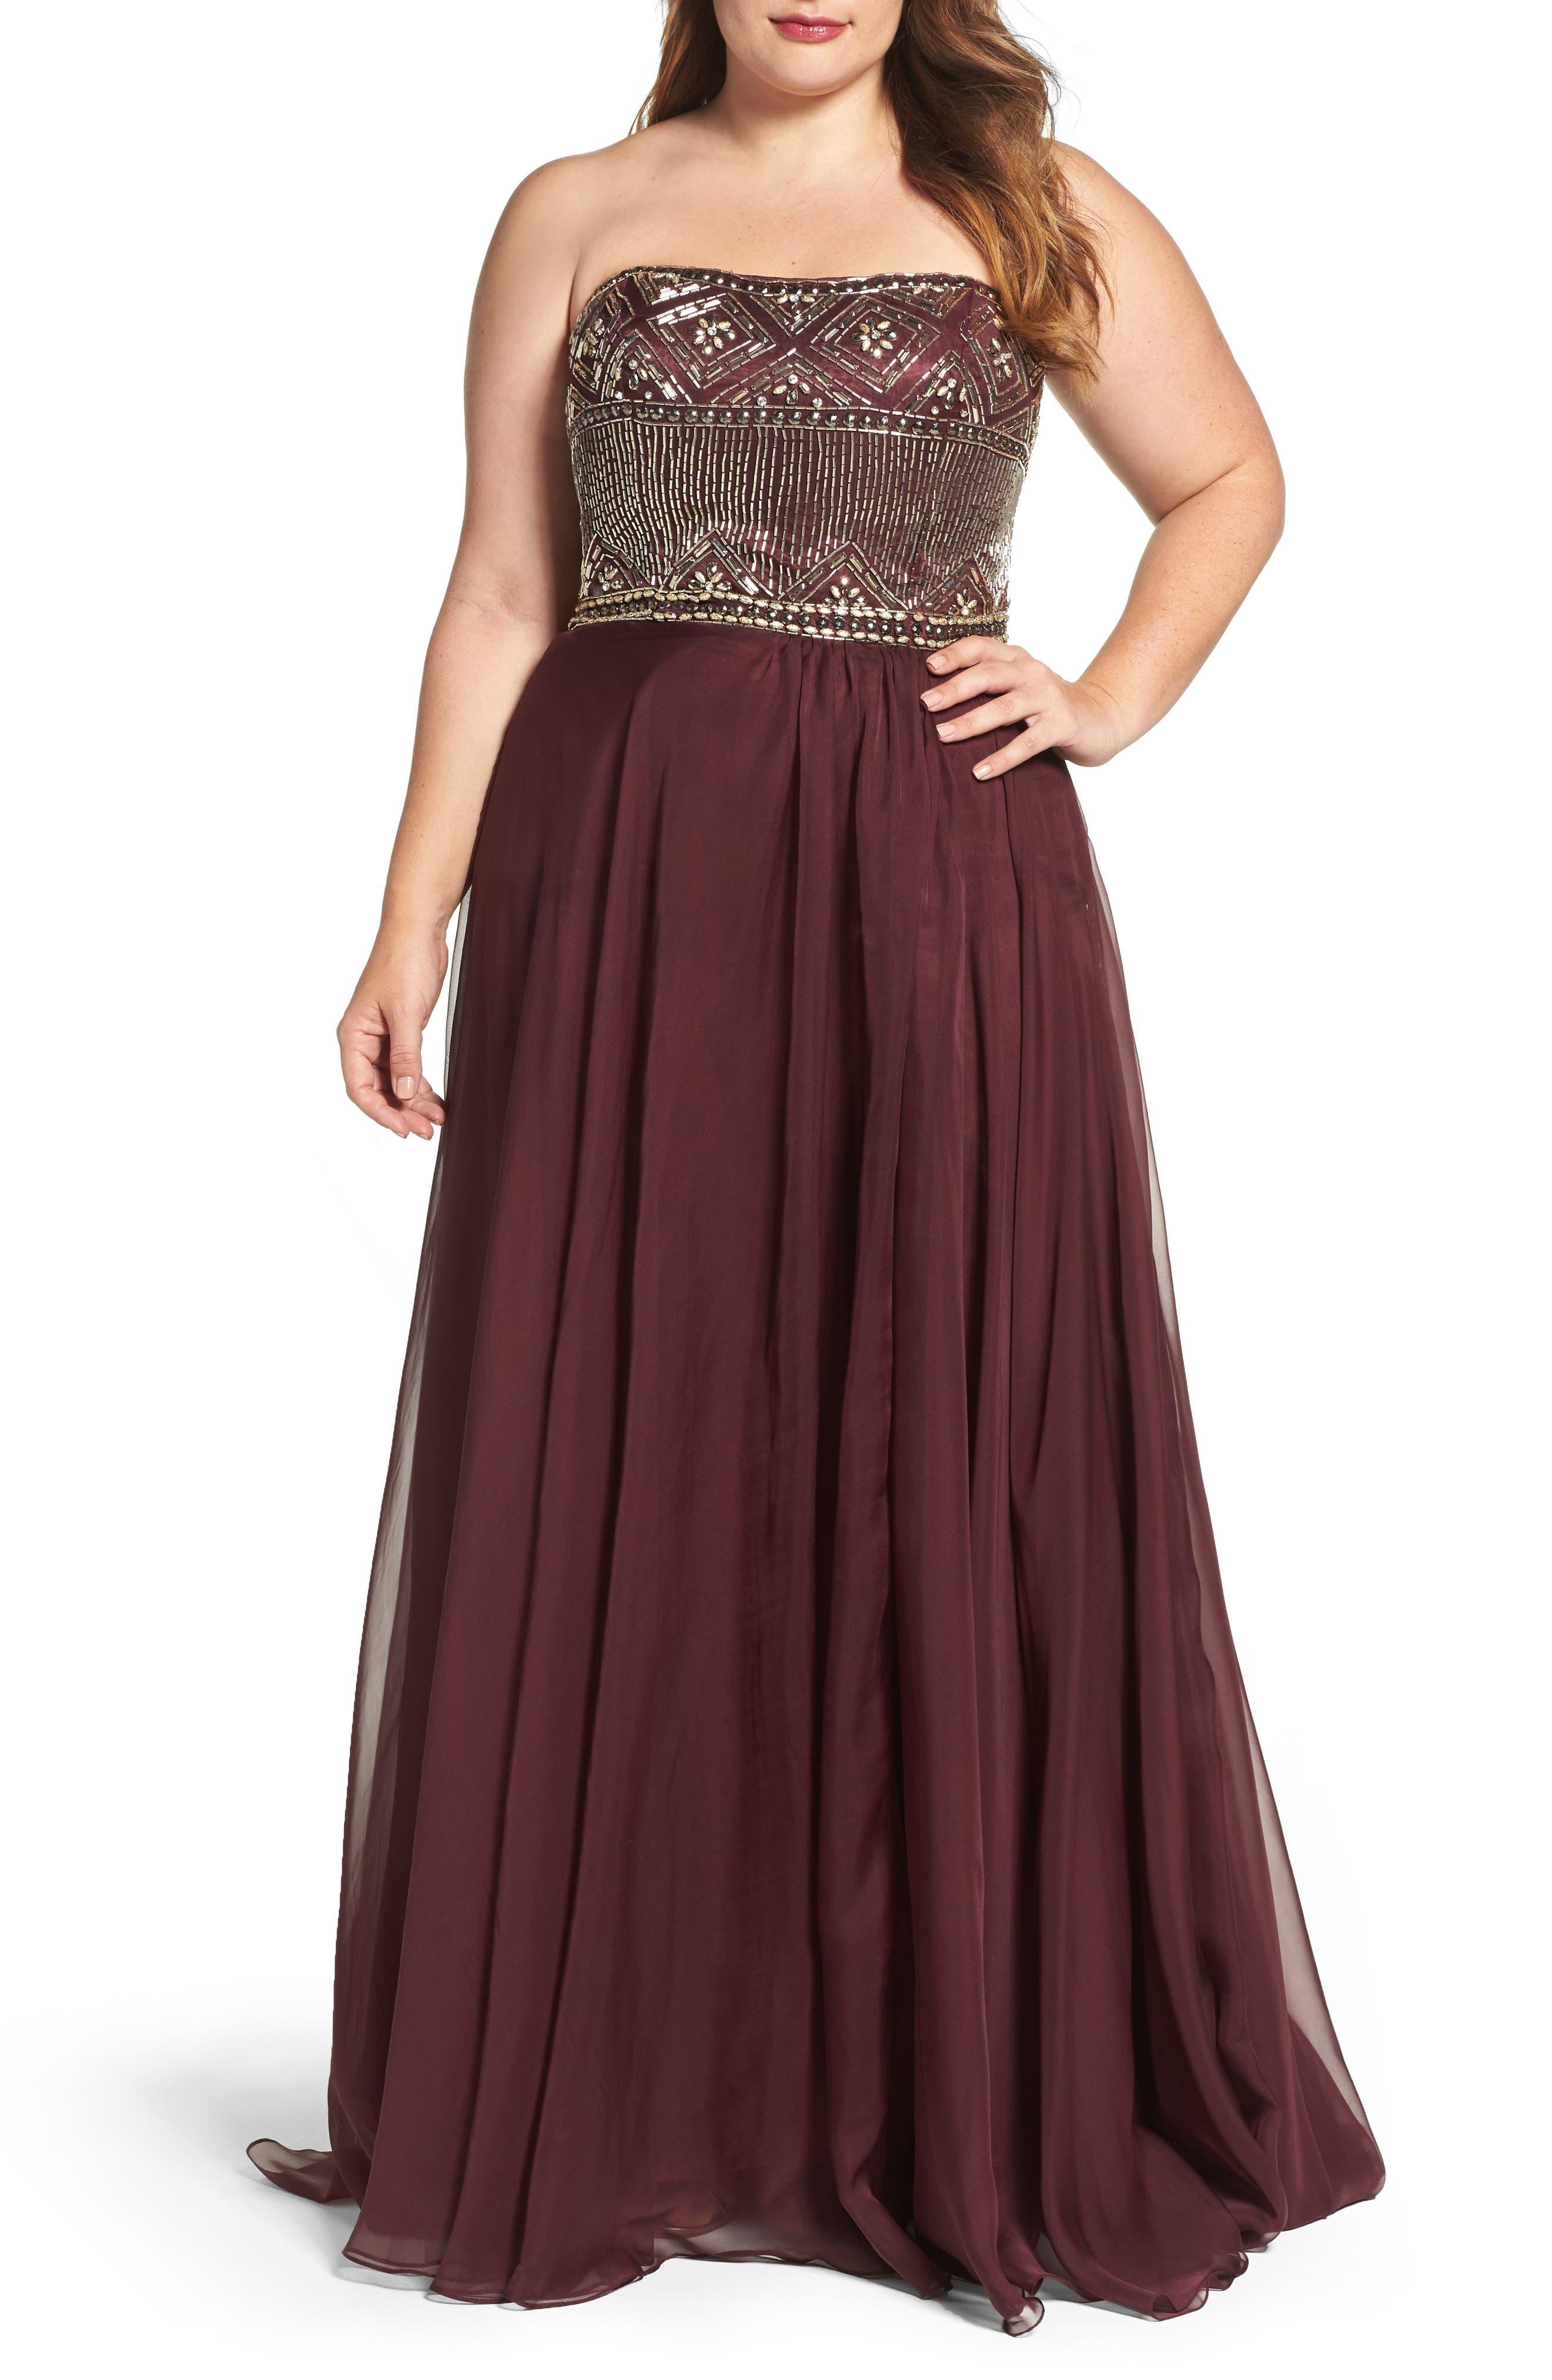 Main Image - Mac Duggal Beaded Bodice Strapless Chiffon Gown (Plus Size)